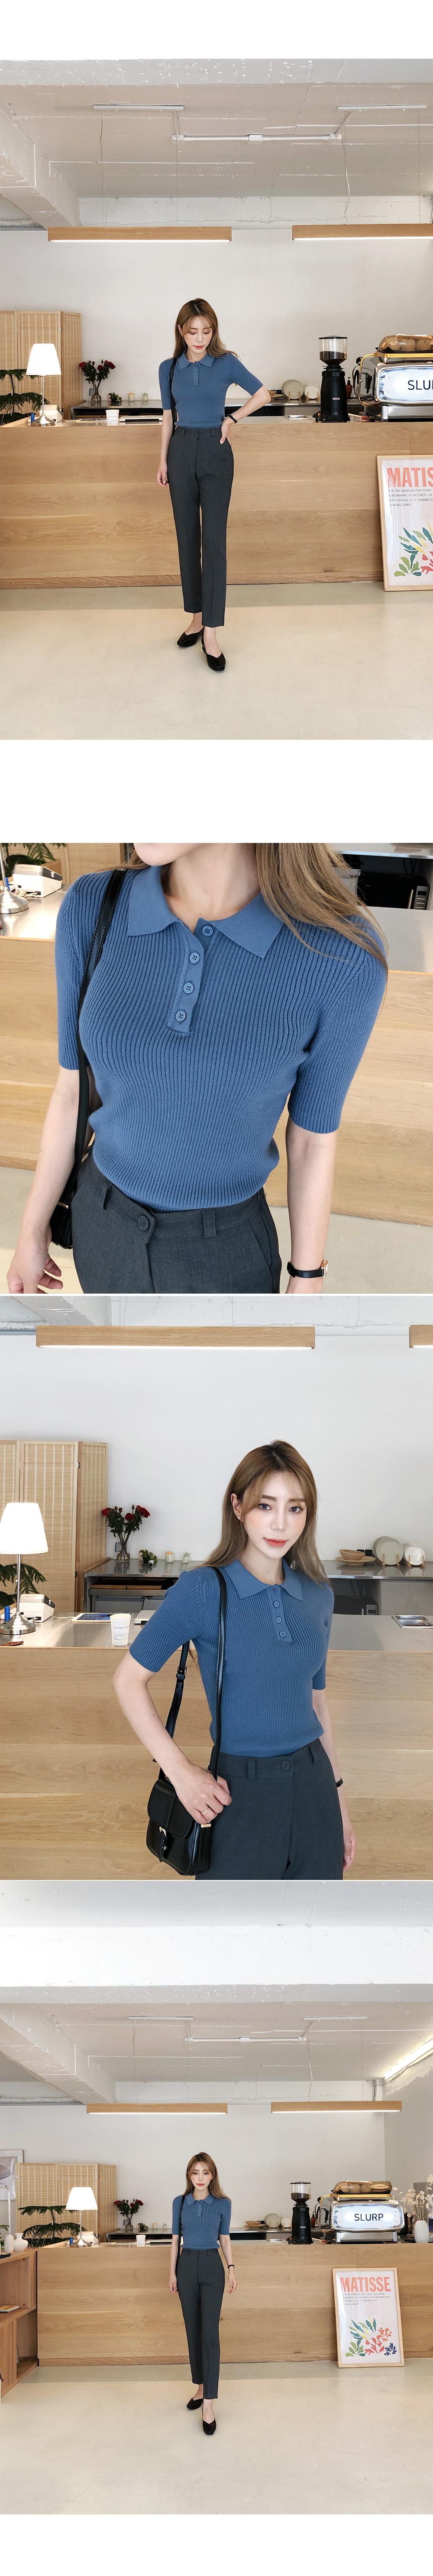 Kara pretty corrugated knit